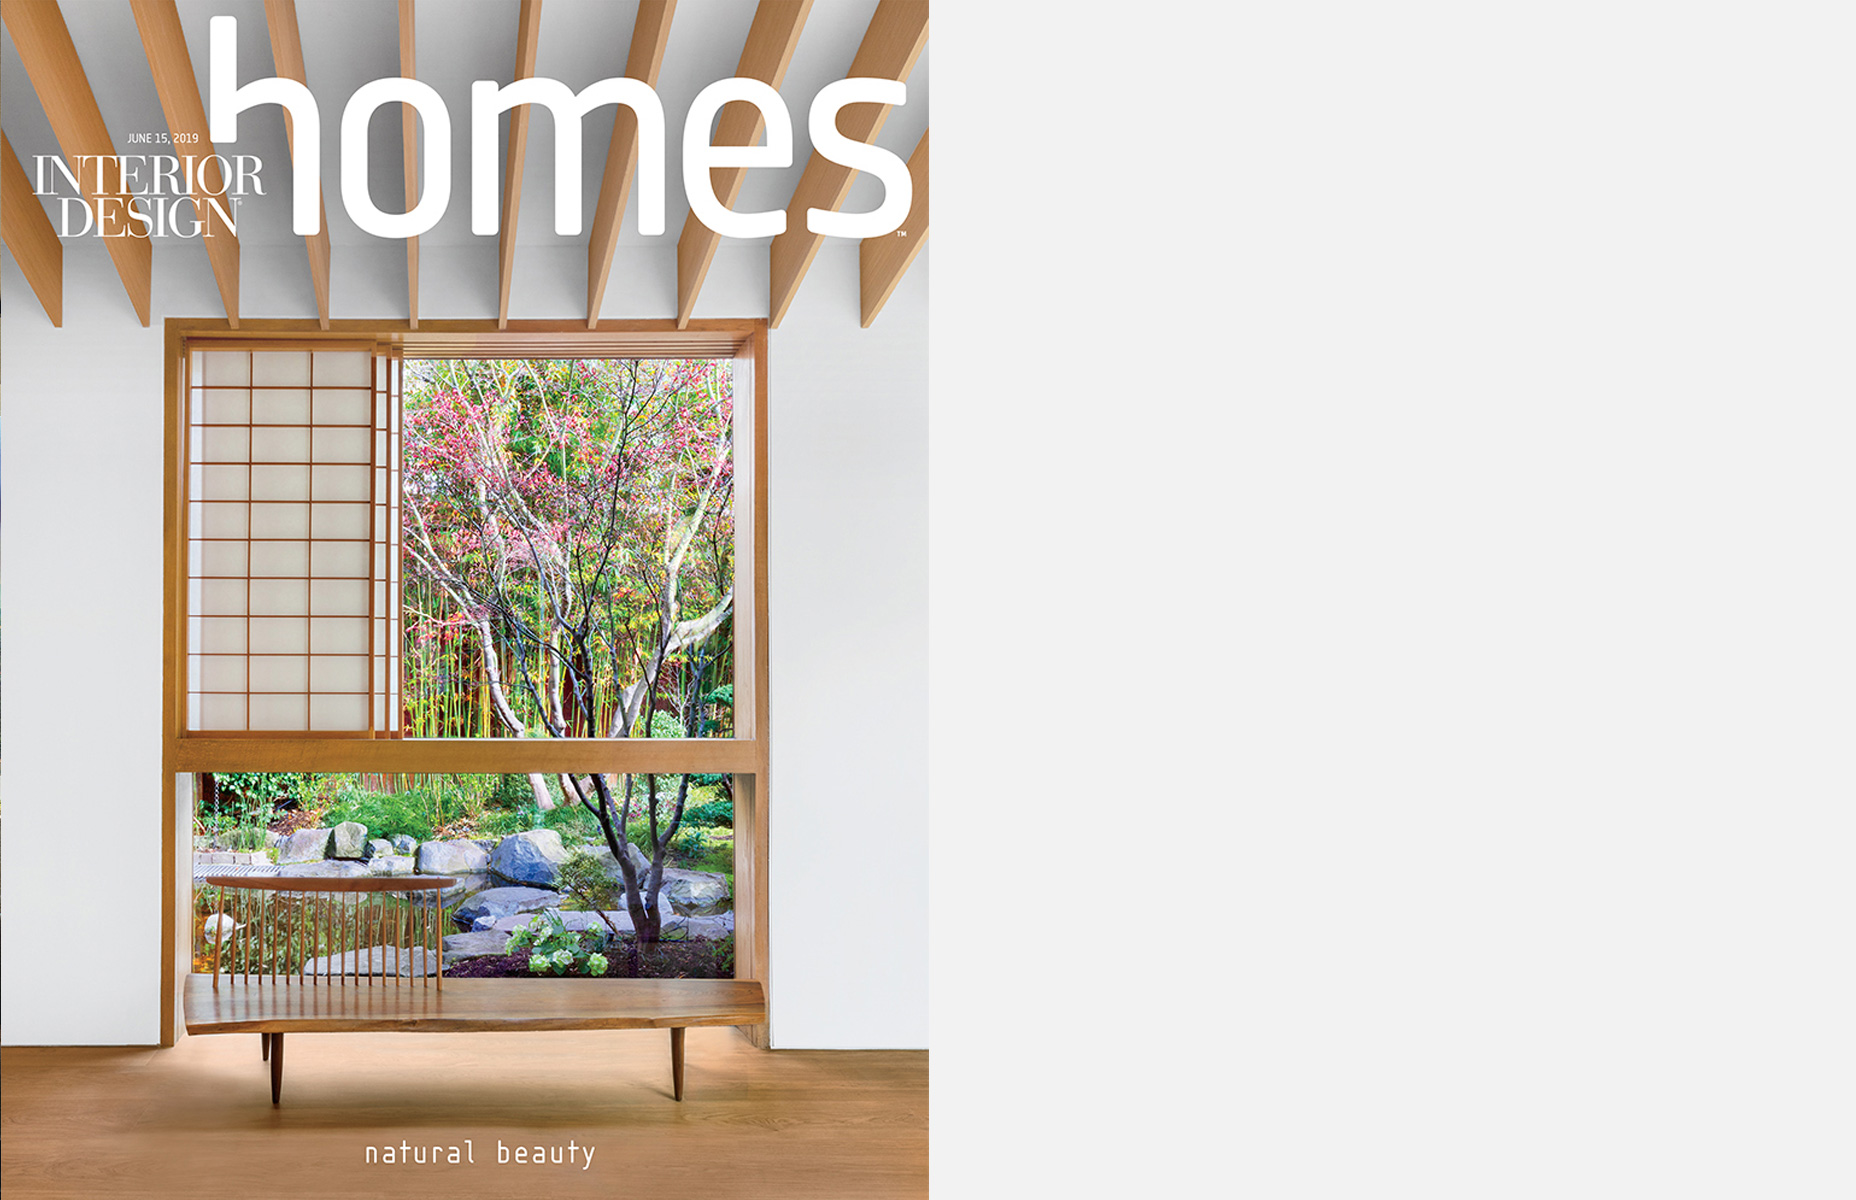 19-06-interiordesign-cover.jpg